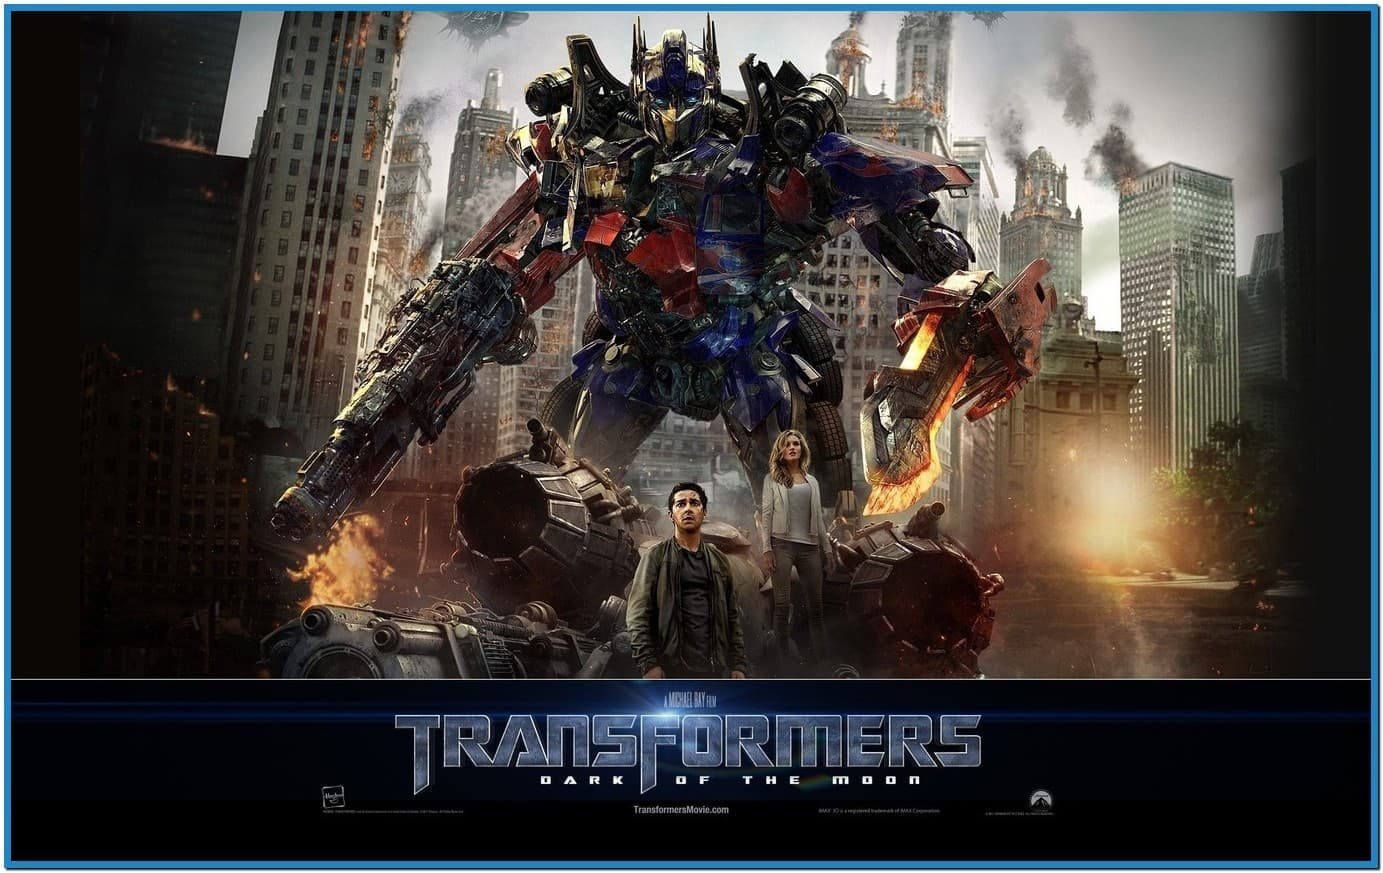 Movie wallpapers net transformers screensaver   Download 1383x873